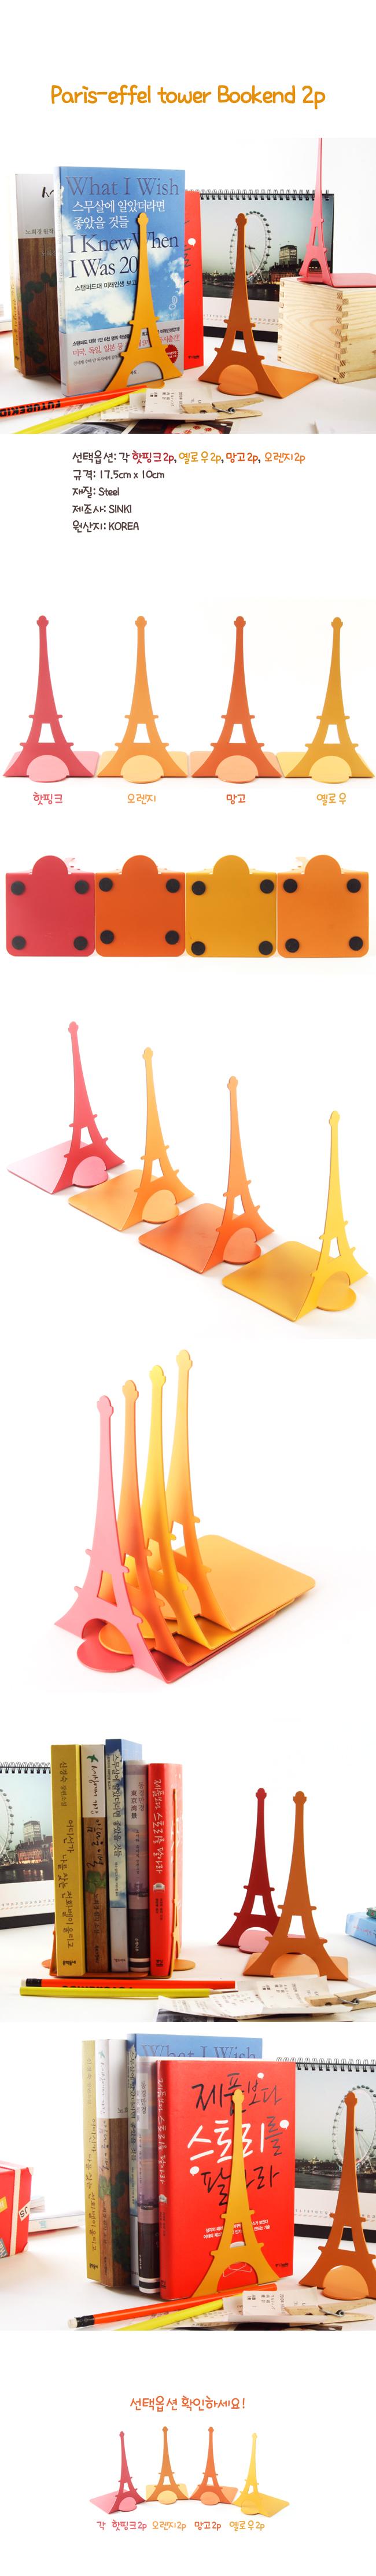 Paris-effel tower bookend 2P - 신기, 8,800원, 독서용품, 북앤드